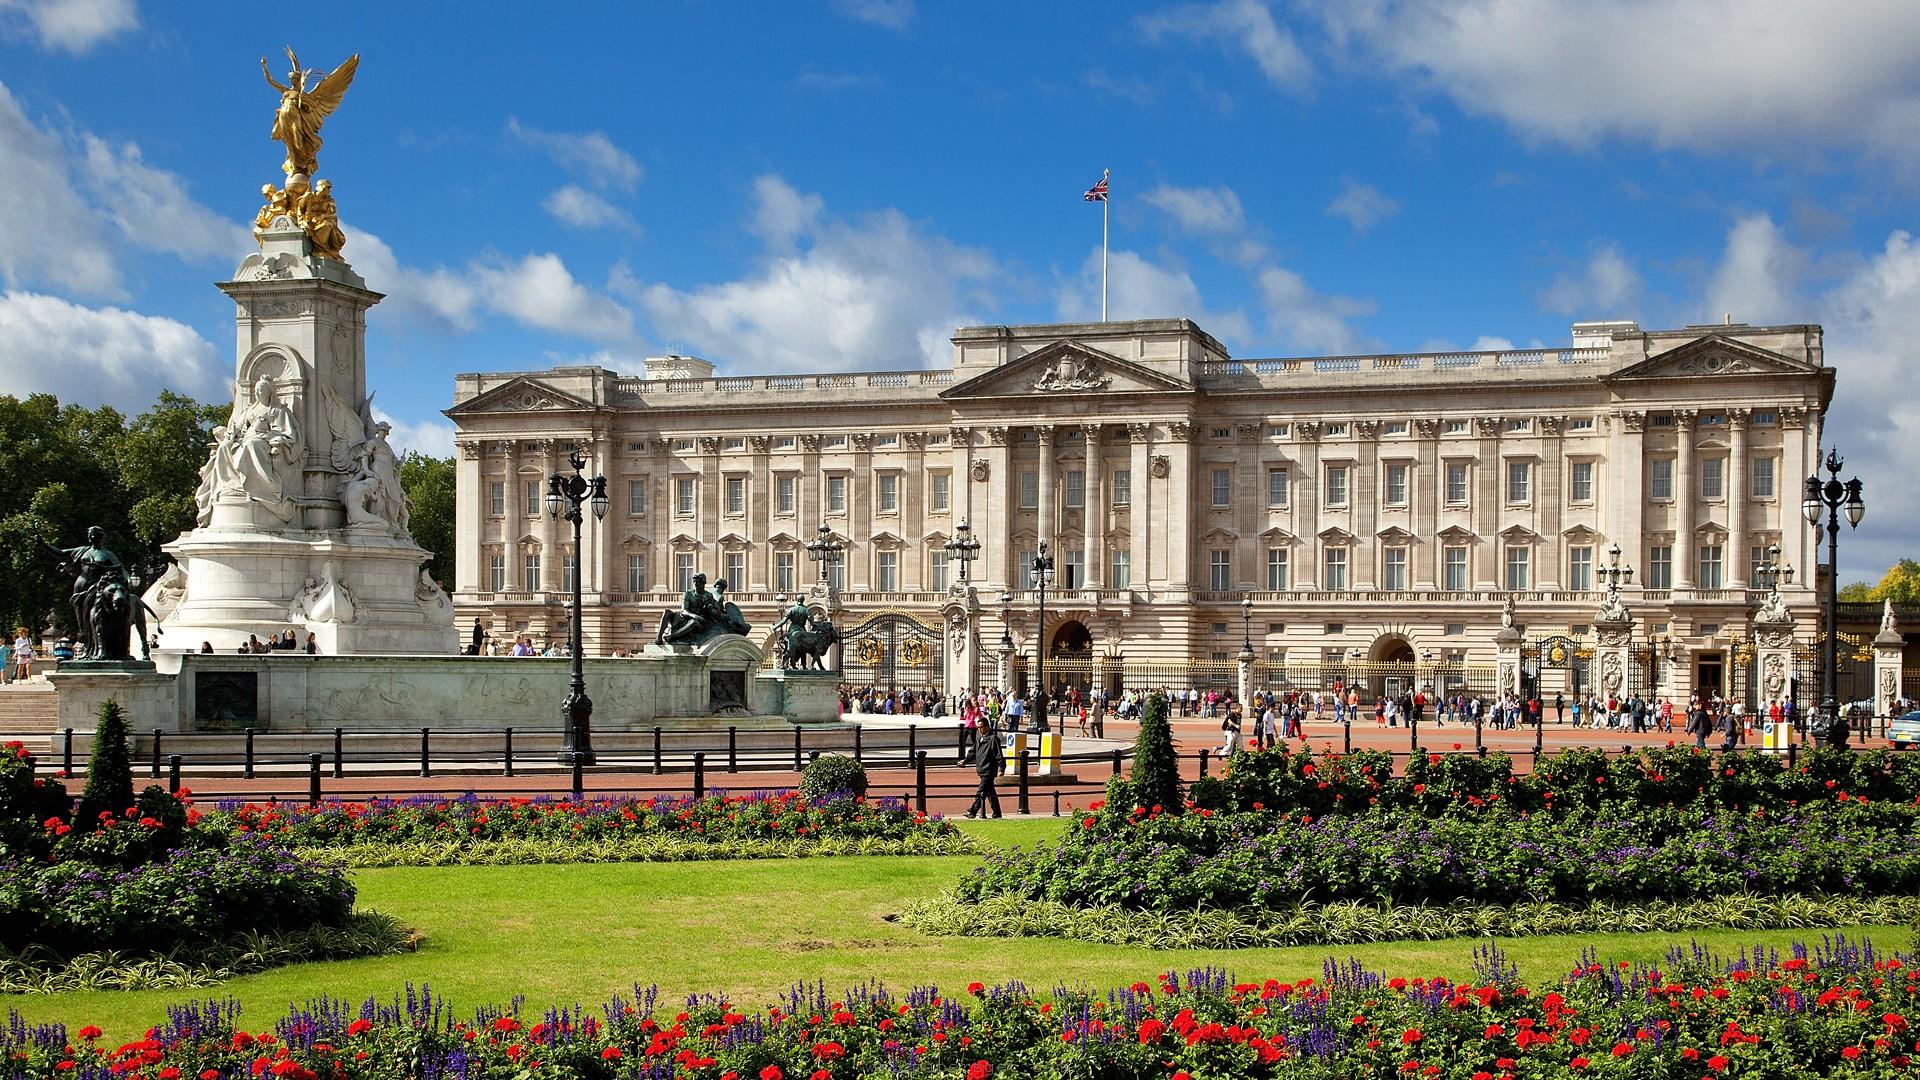 17.BuckinghamPalace